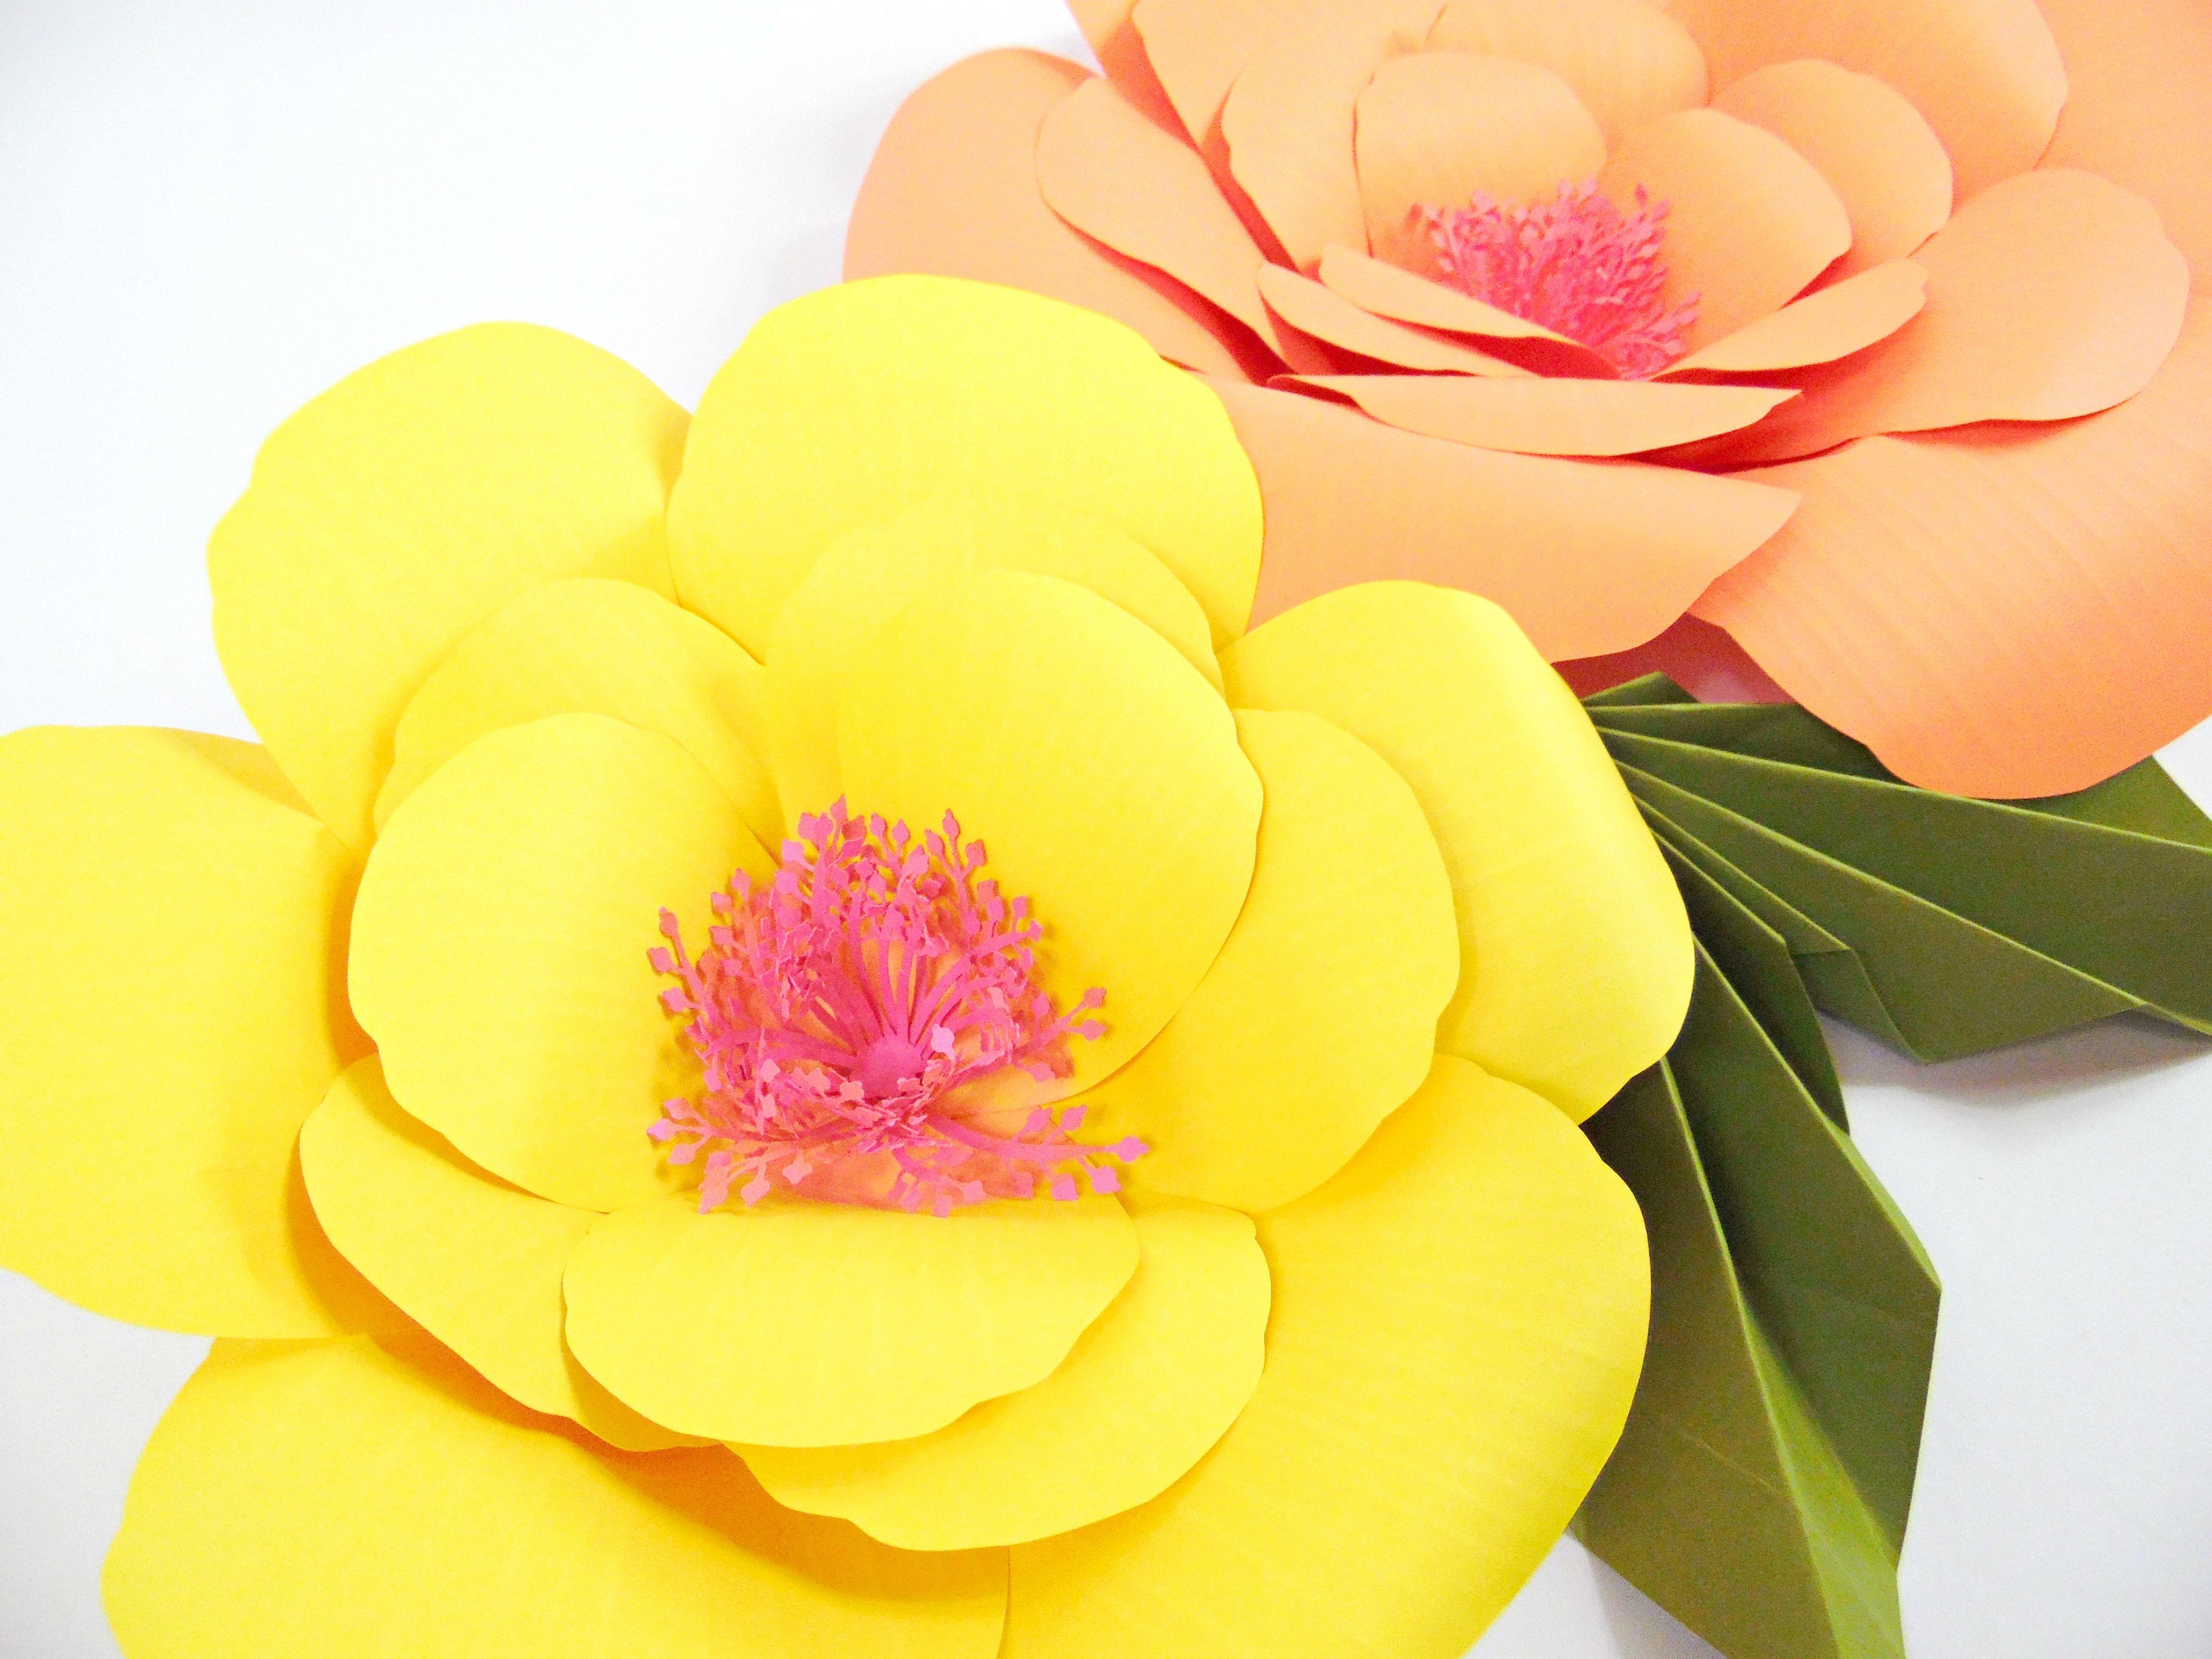 Giant paper flower tutorials diy large hibiscus flowers paper giant paper flower tutorials diy large hibiscus flowers izmirmasajfo